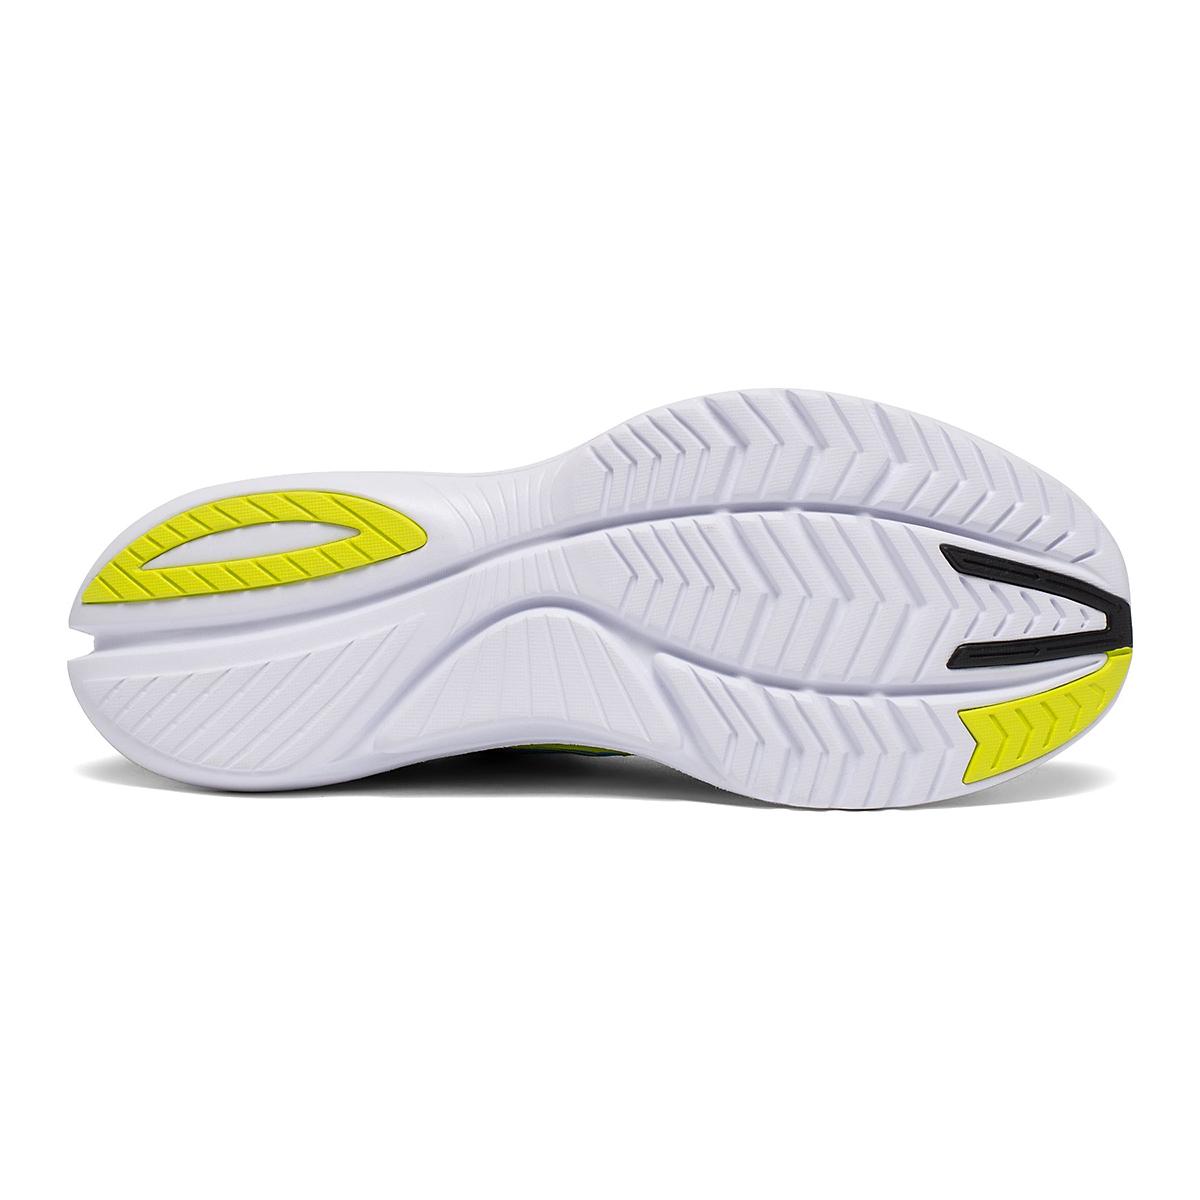 Men's Saucony Kinvara 12 Running Shoe - Color: Cobalt/Citrus - Size: 7 - Width: Regular, Cobalt/Citrus, large, image 4